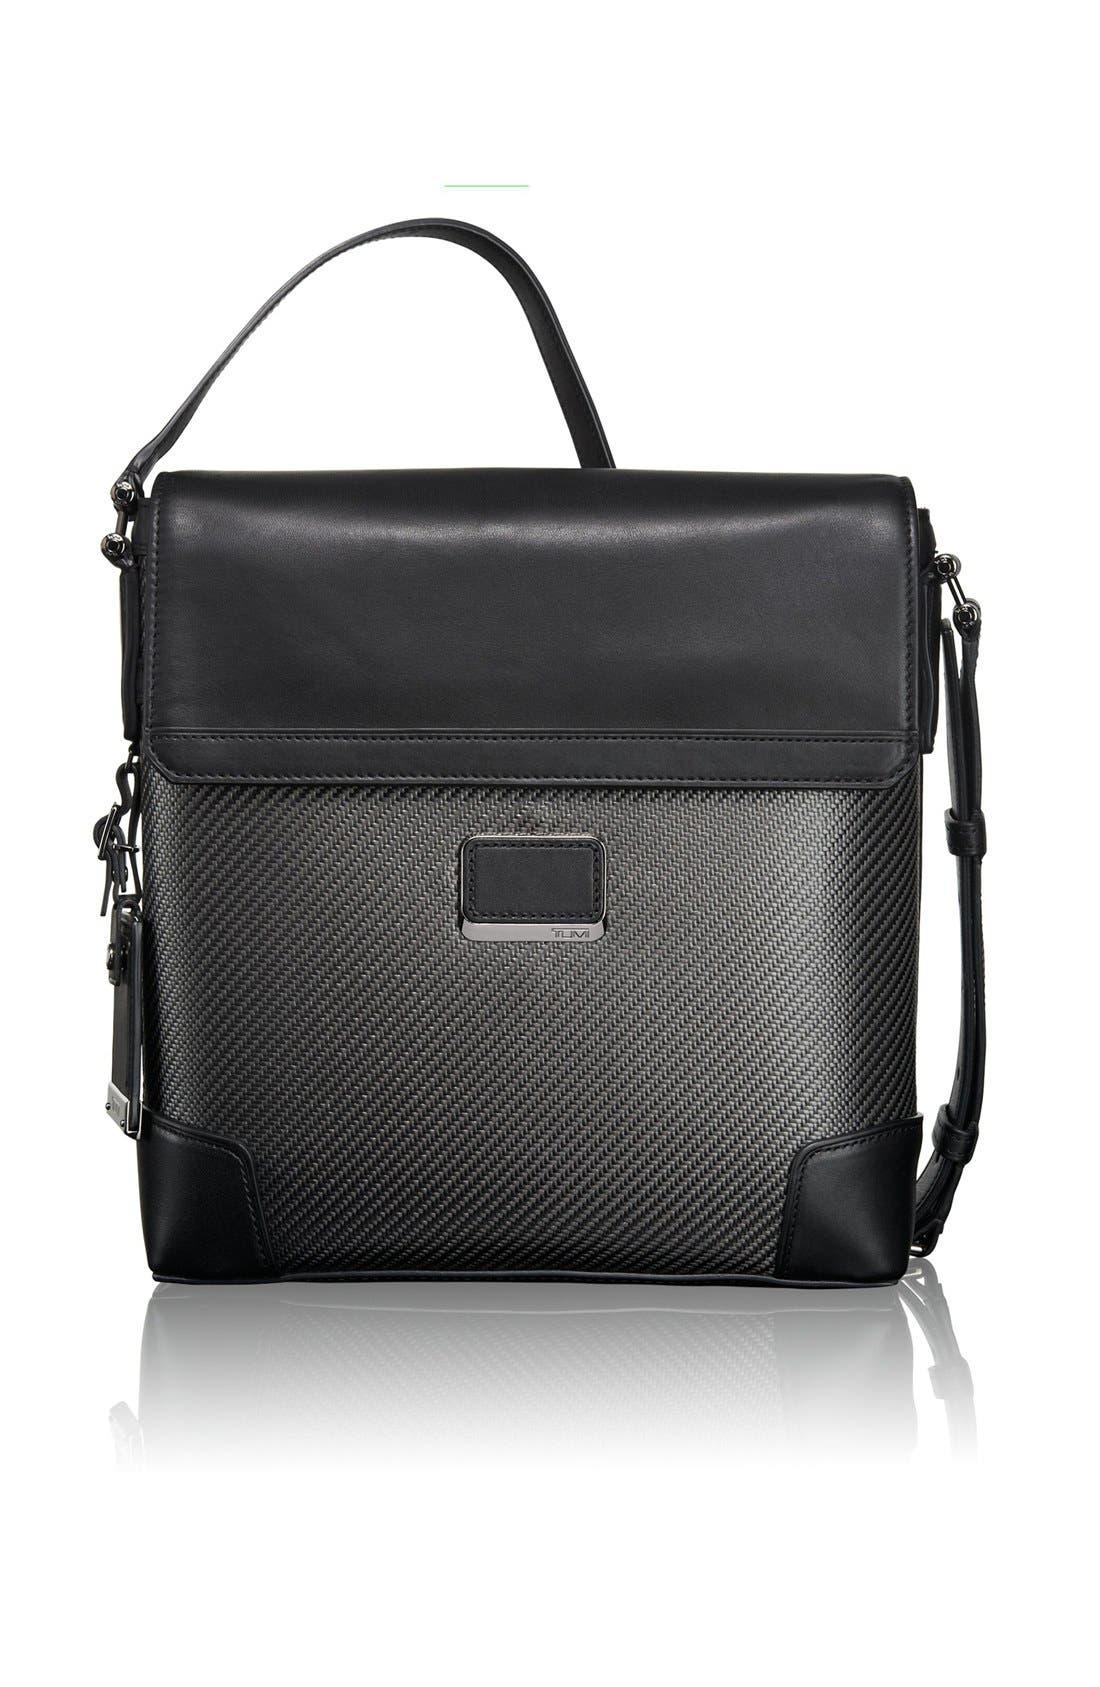 Alternate Image 1 Selected - Tumi 'CFX - Suzuka' Carbon Fiber Crossbody Bag